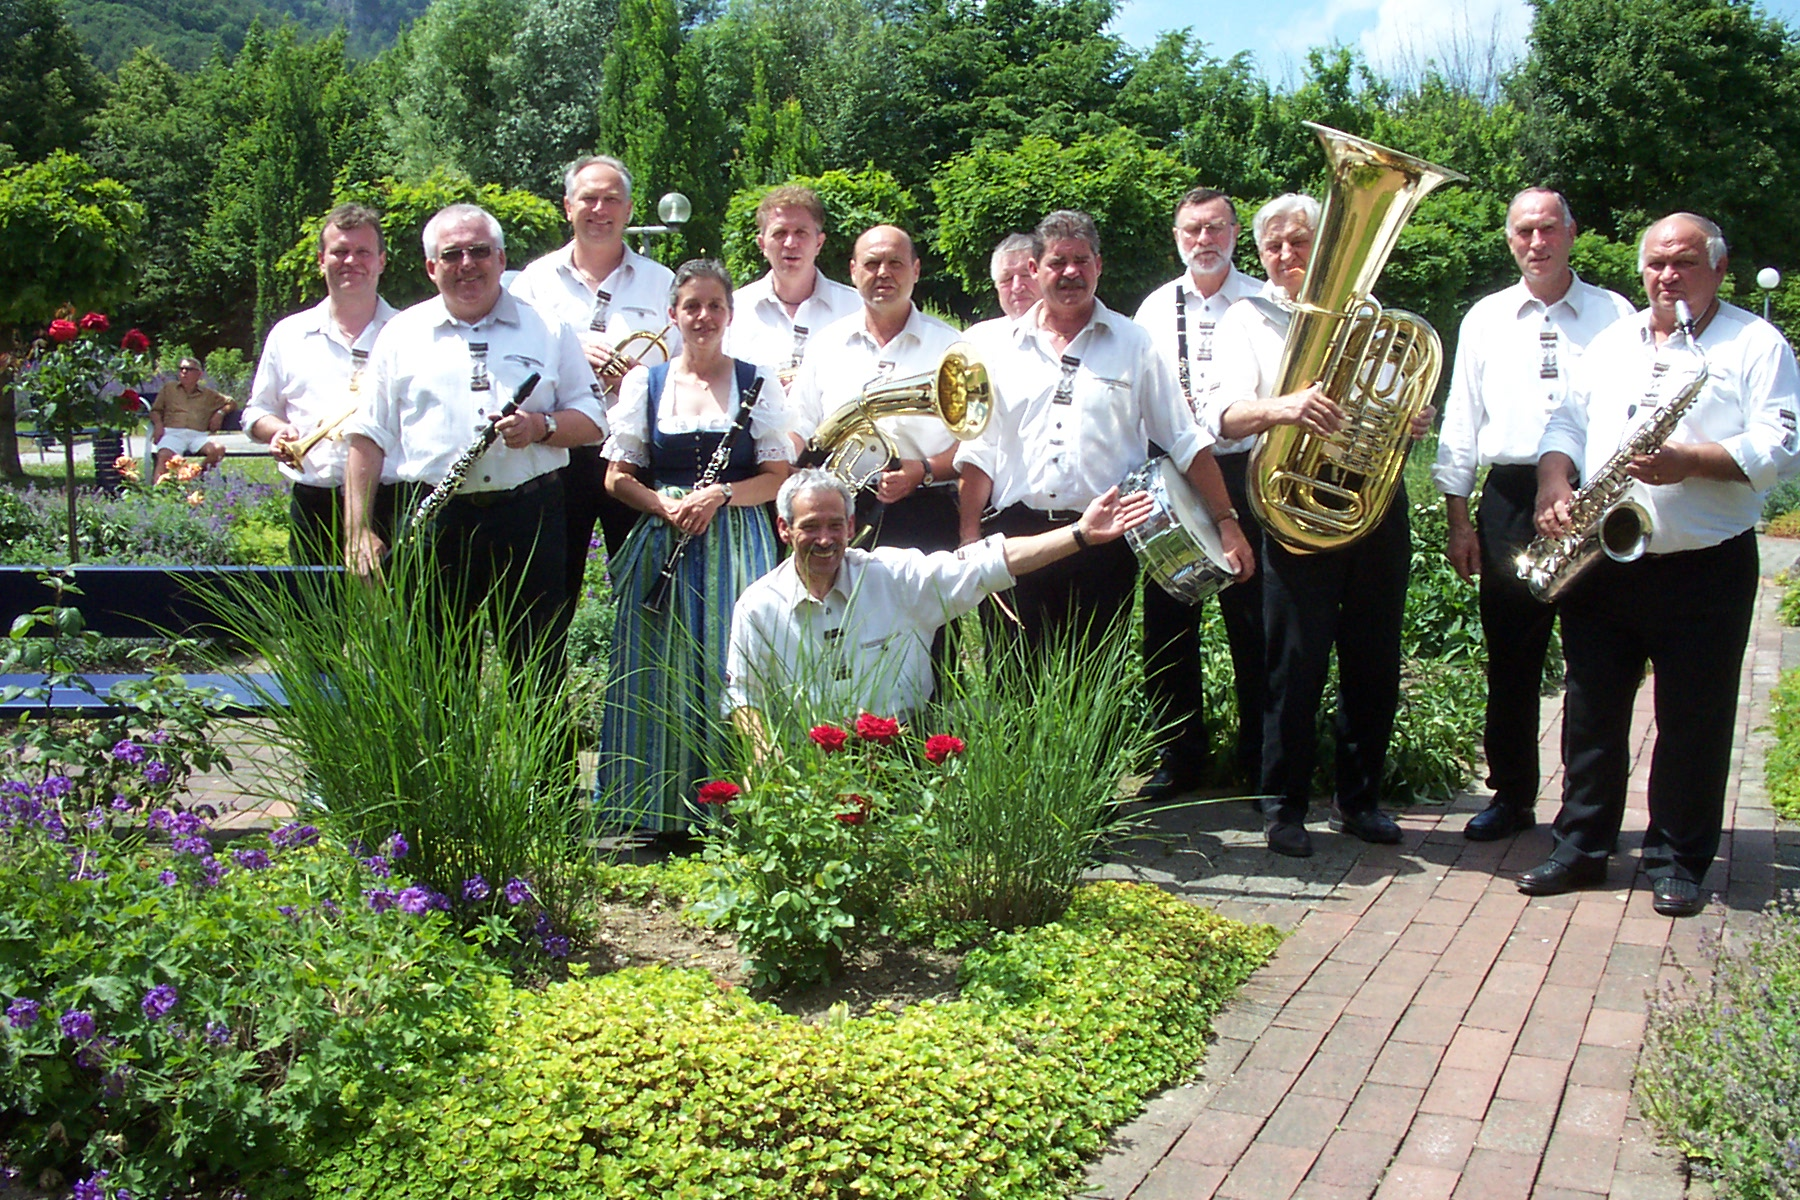 Frühschoppen Graf eberhard Hotel Bad Urach 18,06,2006